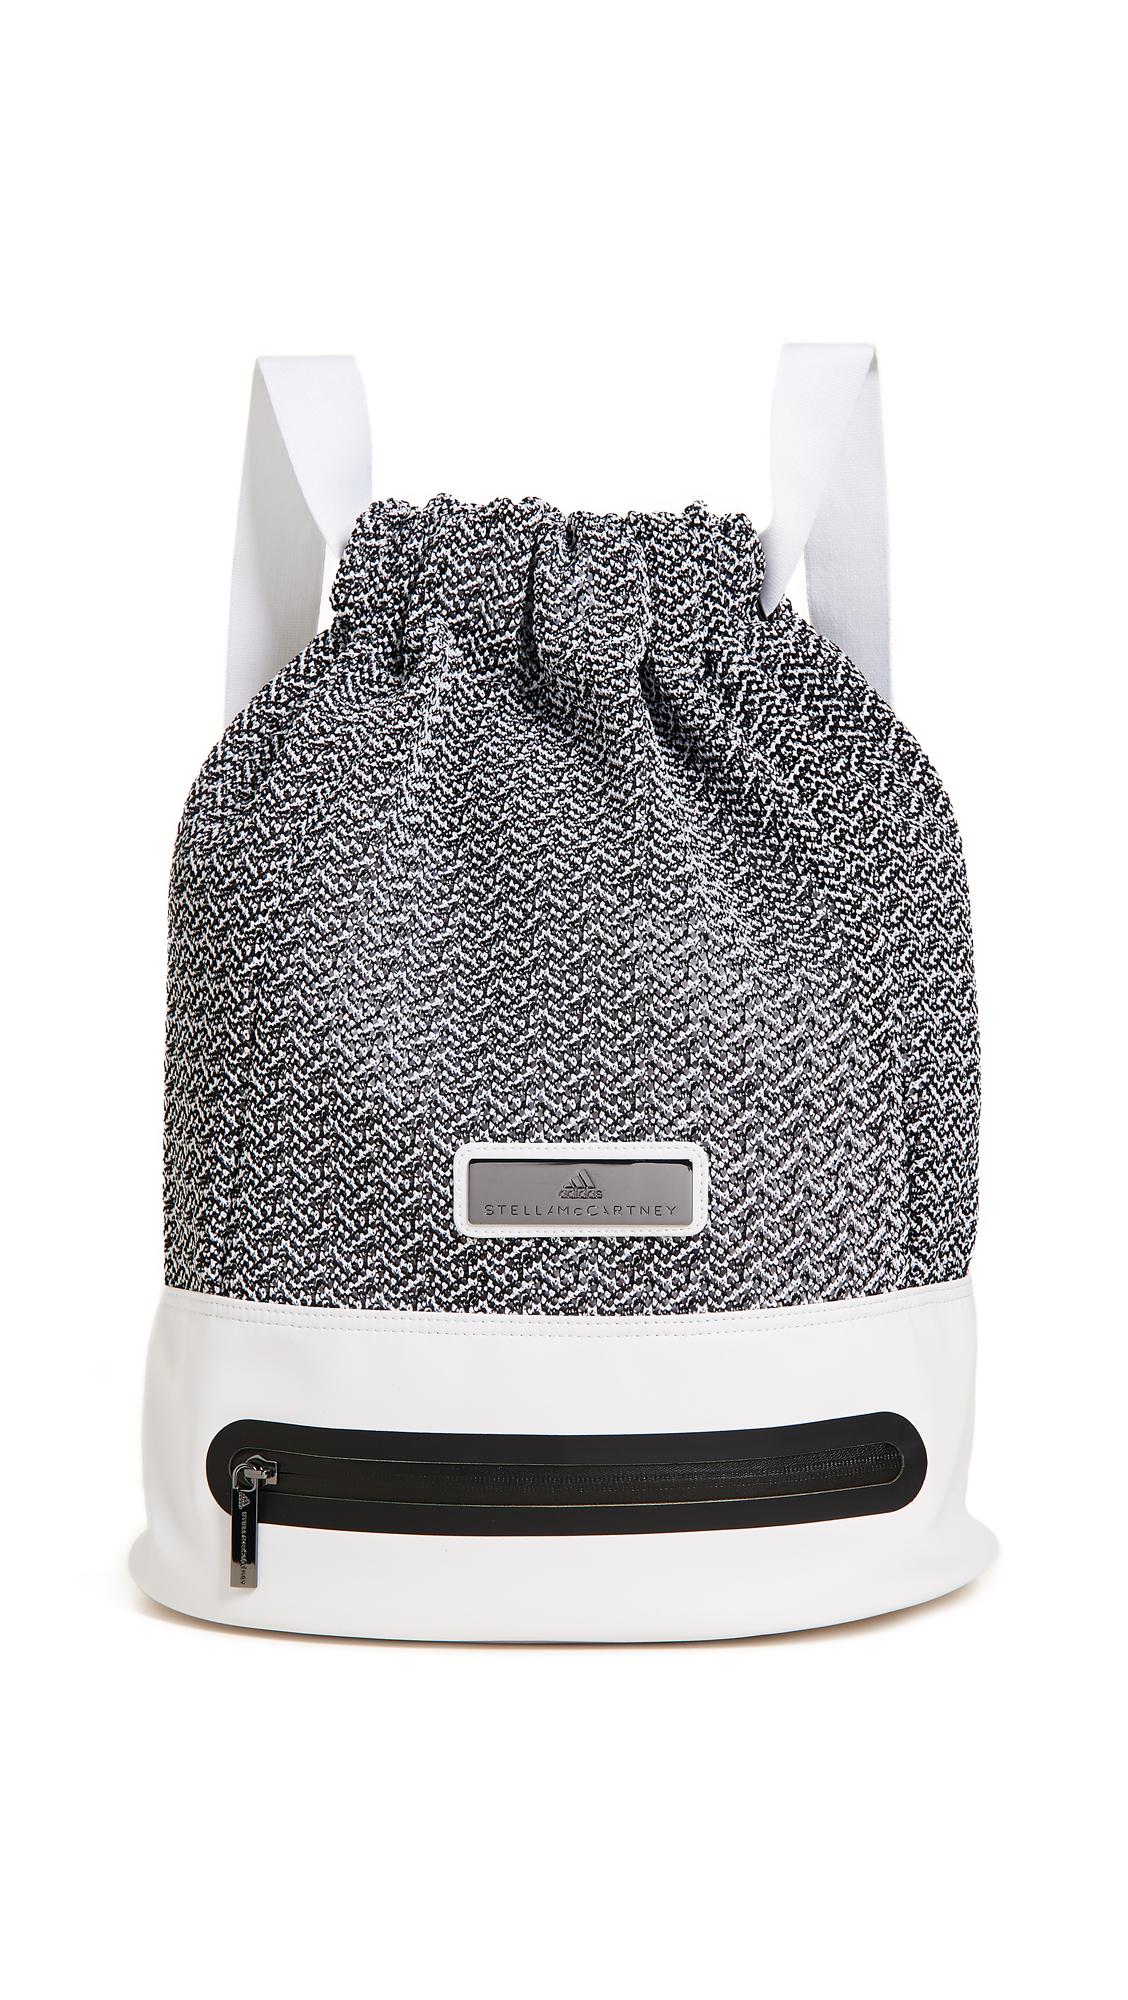 adidas by Stella McCartney Knit Backpack - White/Gunmetal